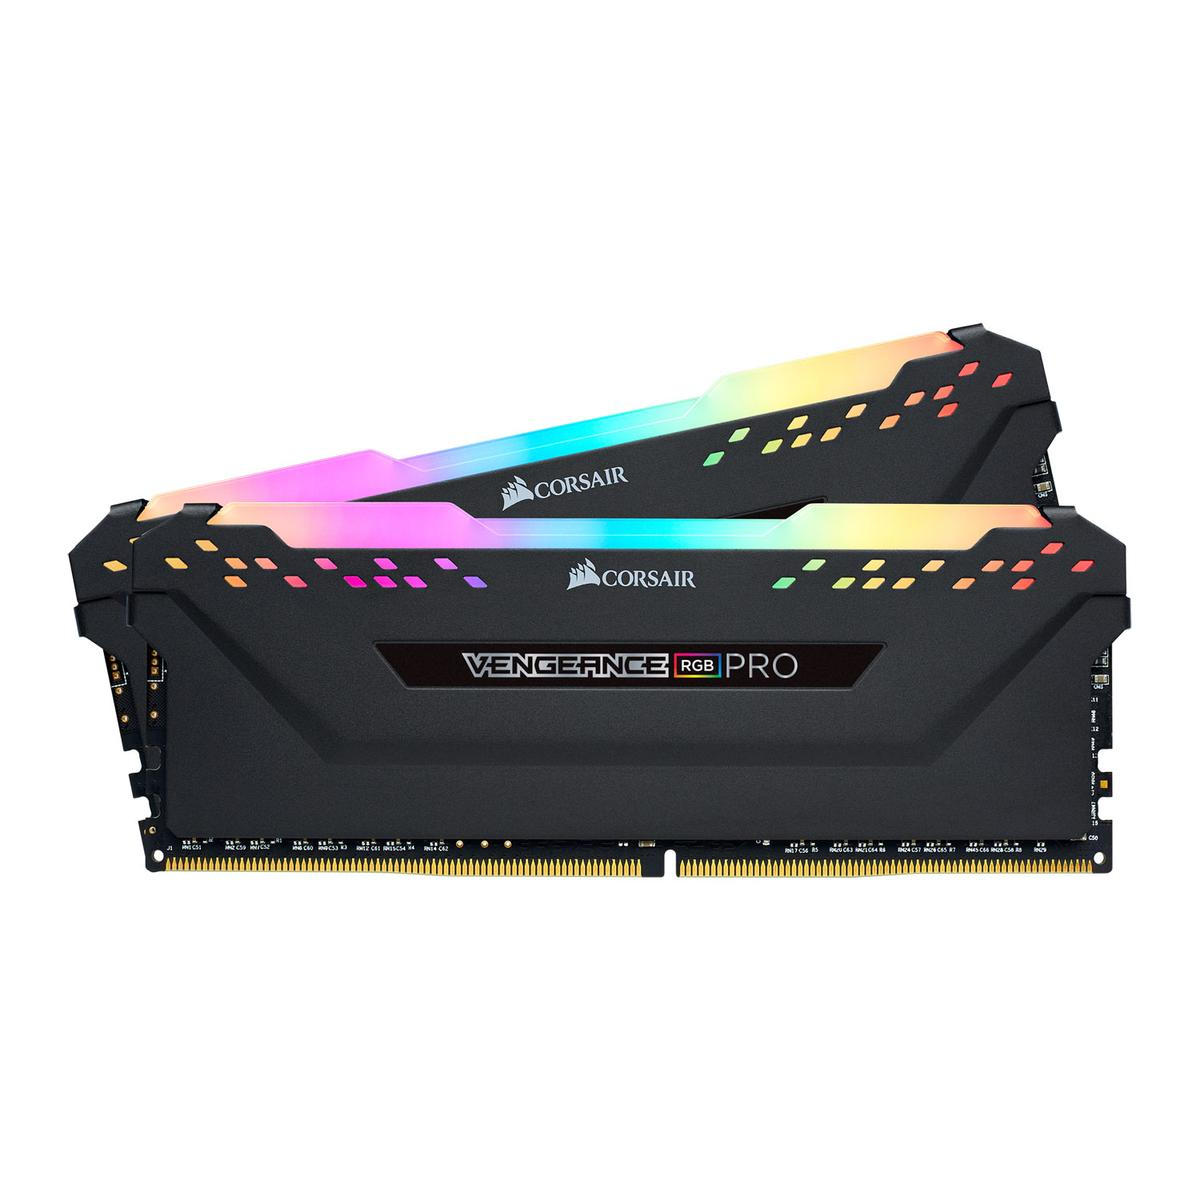 Corsair Vengeance RGB Pro 32 GB (2 x 16 GB) DDR4-3600 CL18 Memory